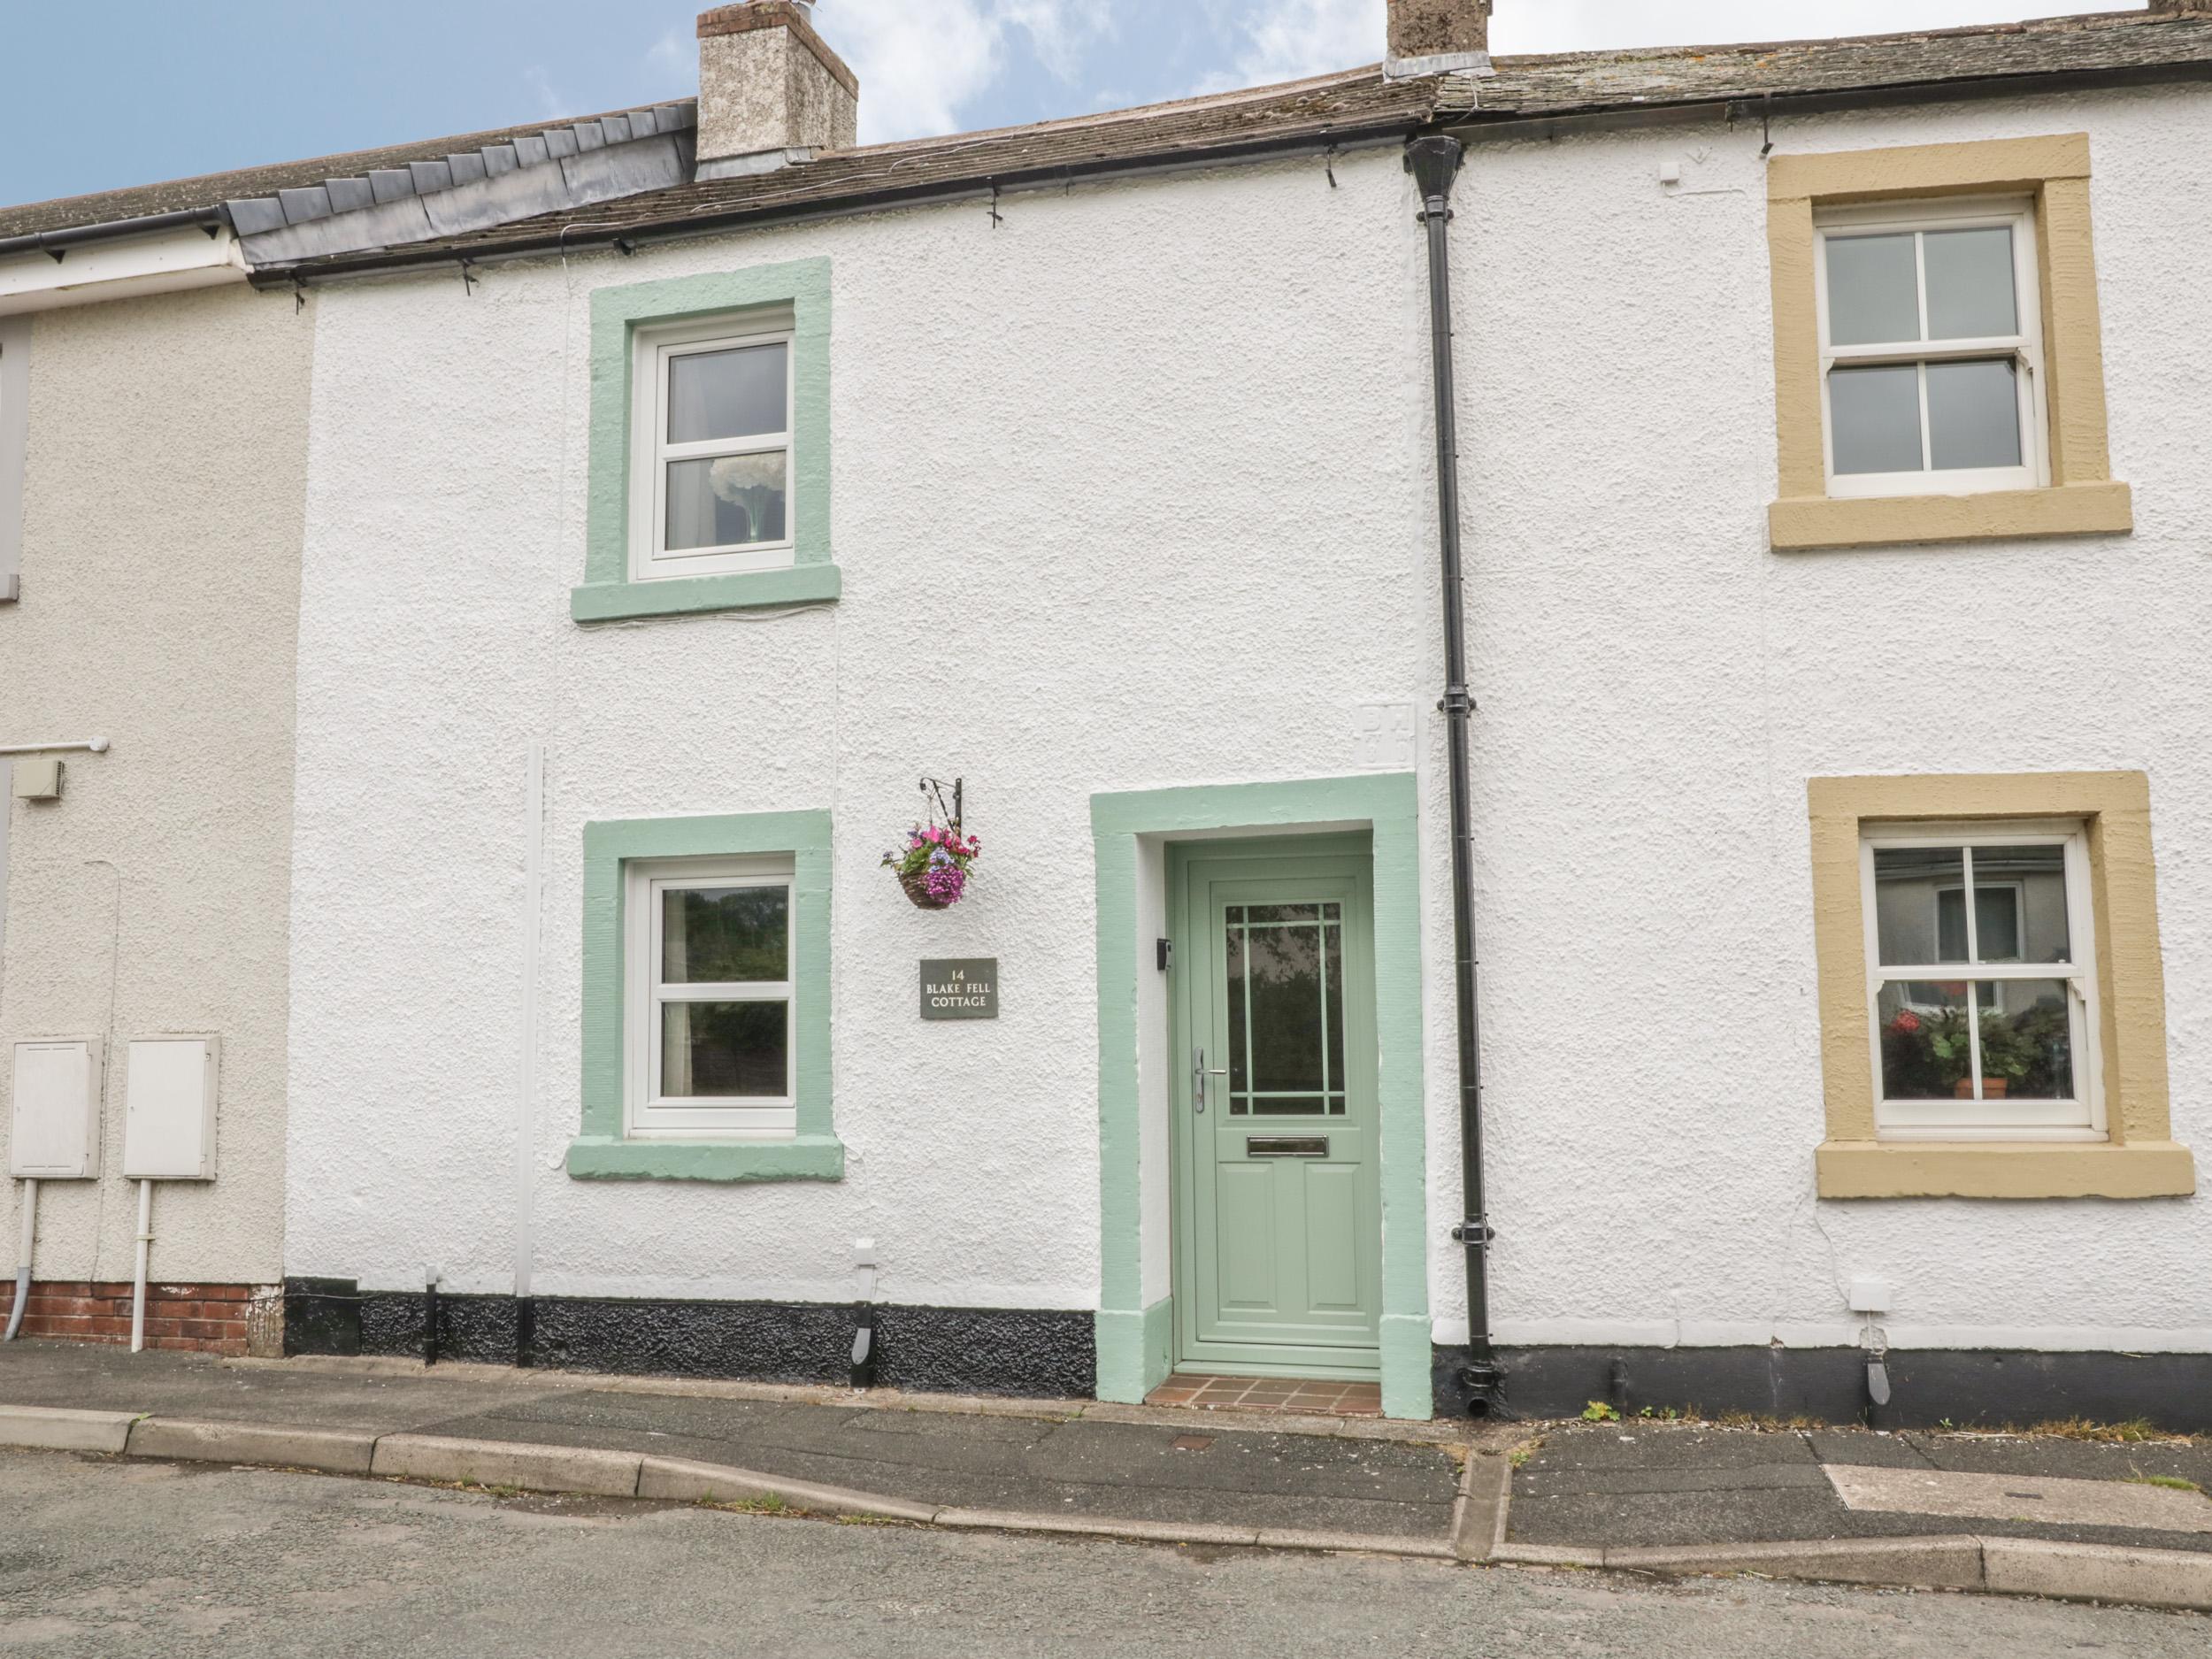 Blake Fell Cottage